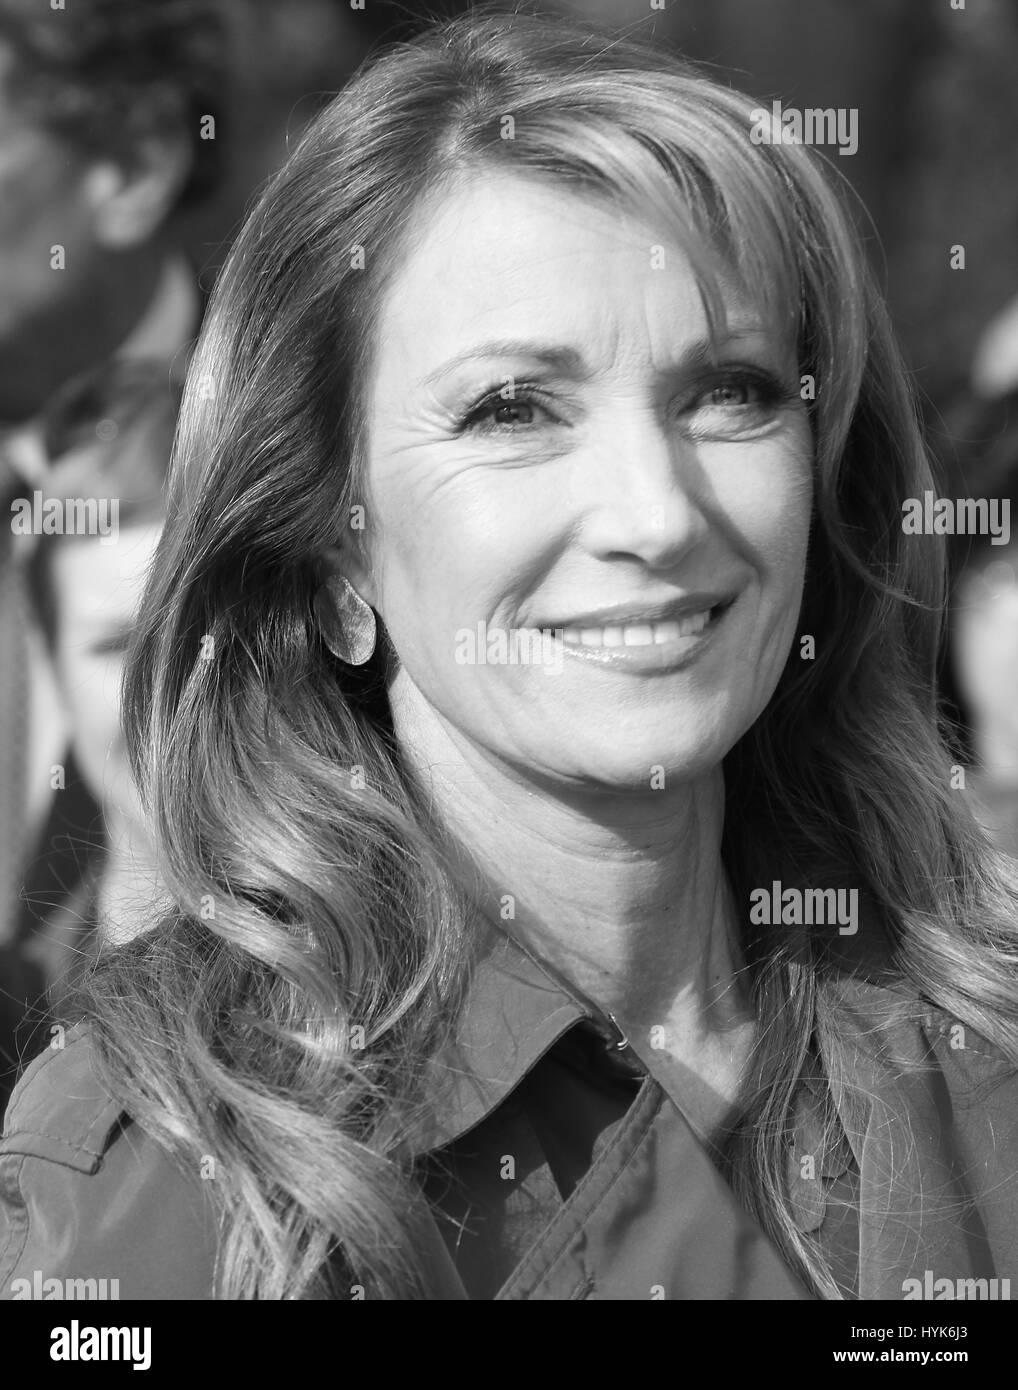 JANE SEYMOUR ACTOR IN LONDON. UK. - Stock Image